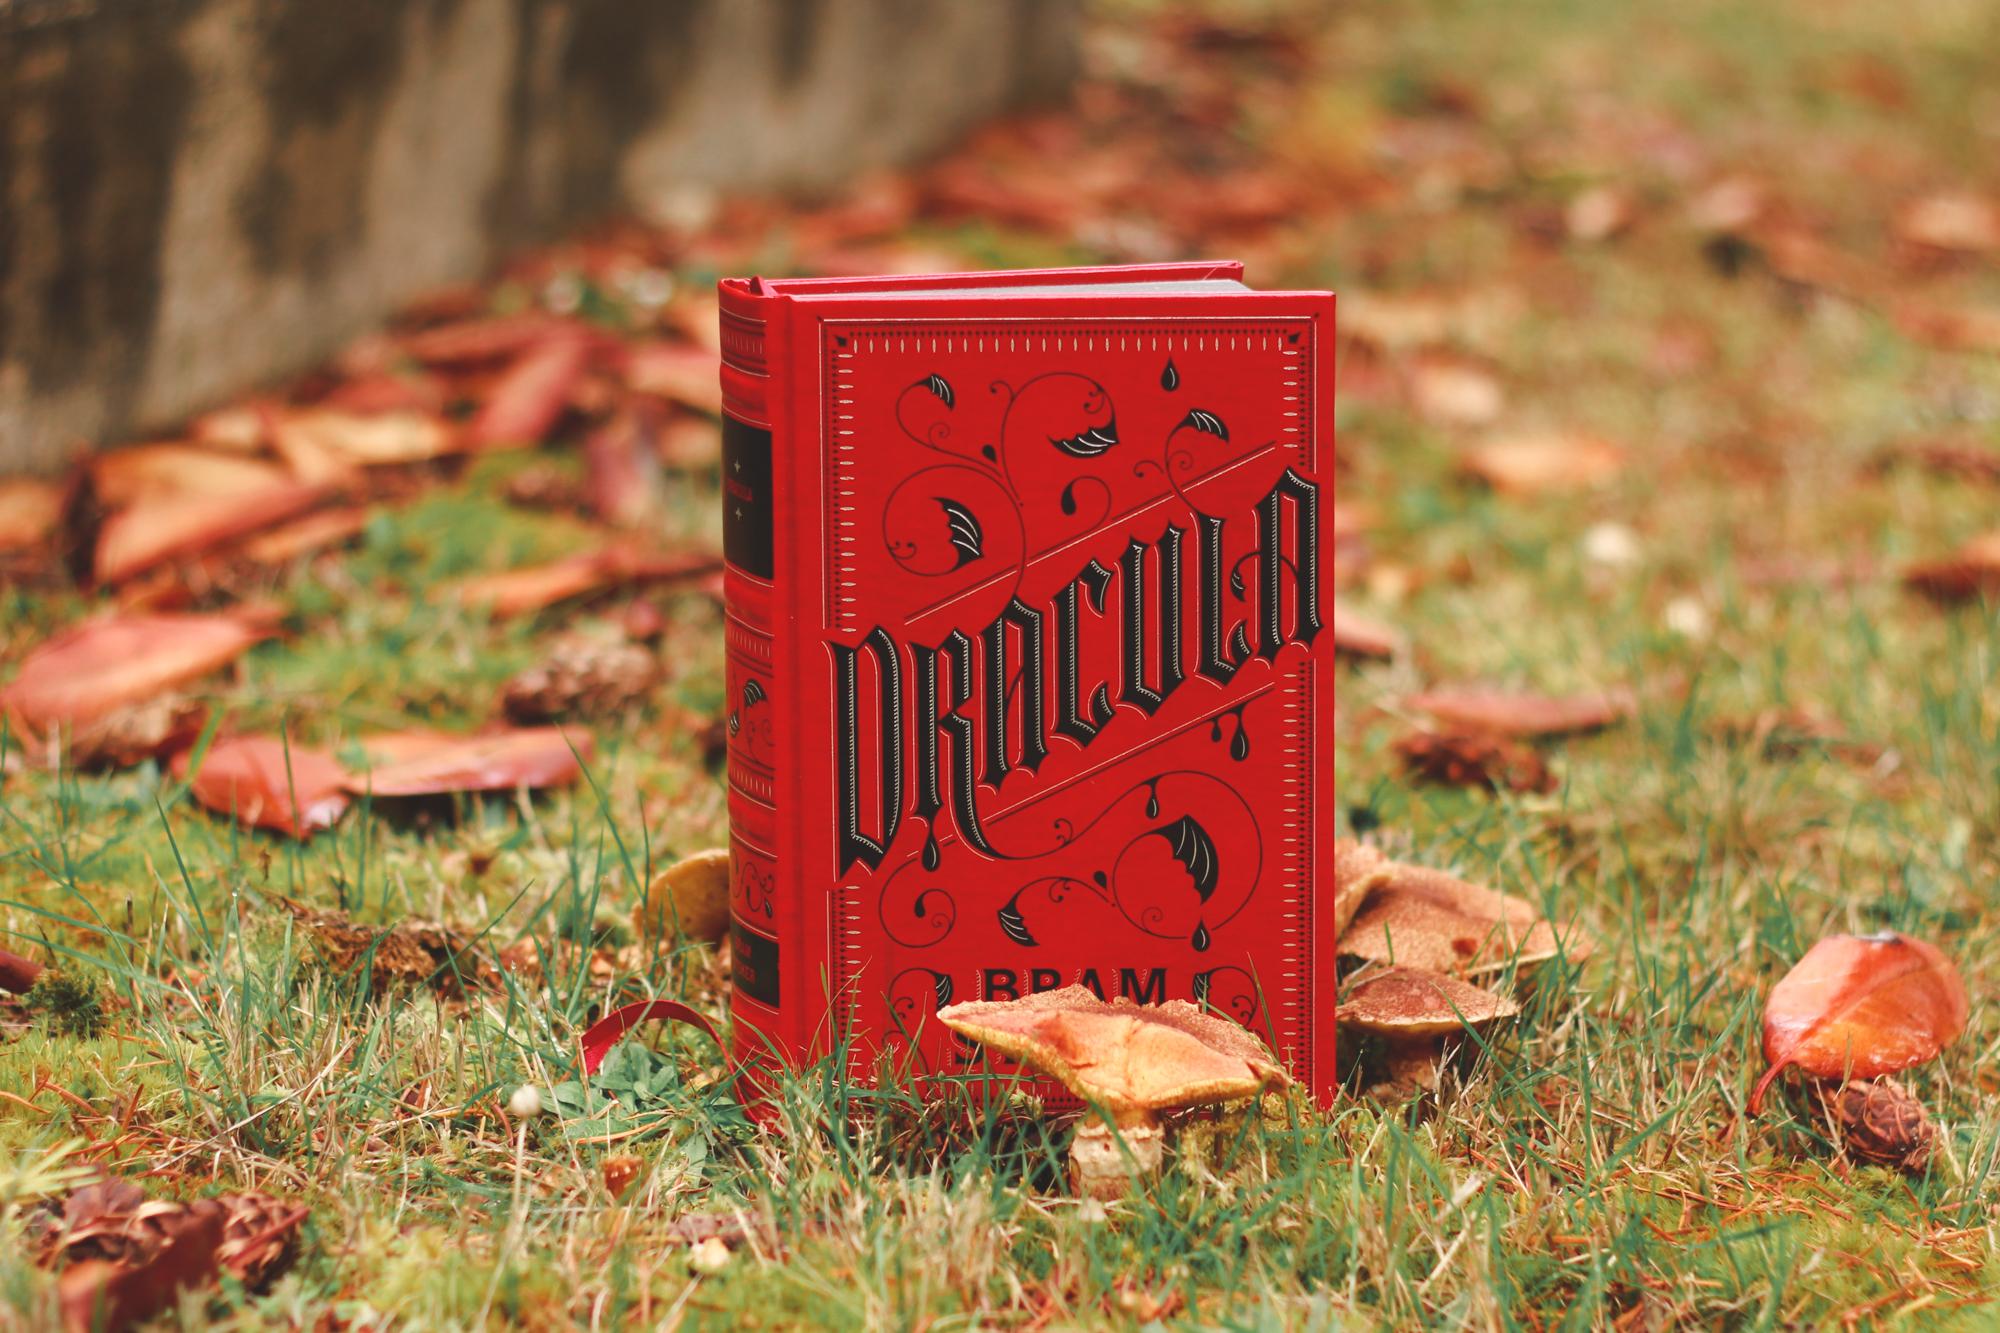 Dracula | eyreeffect.com